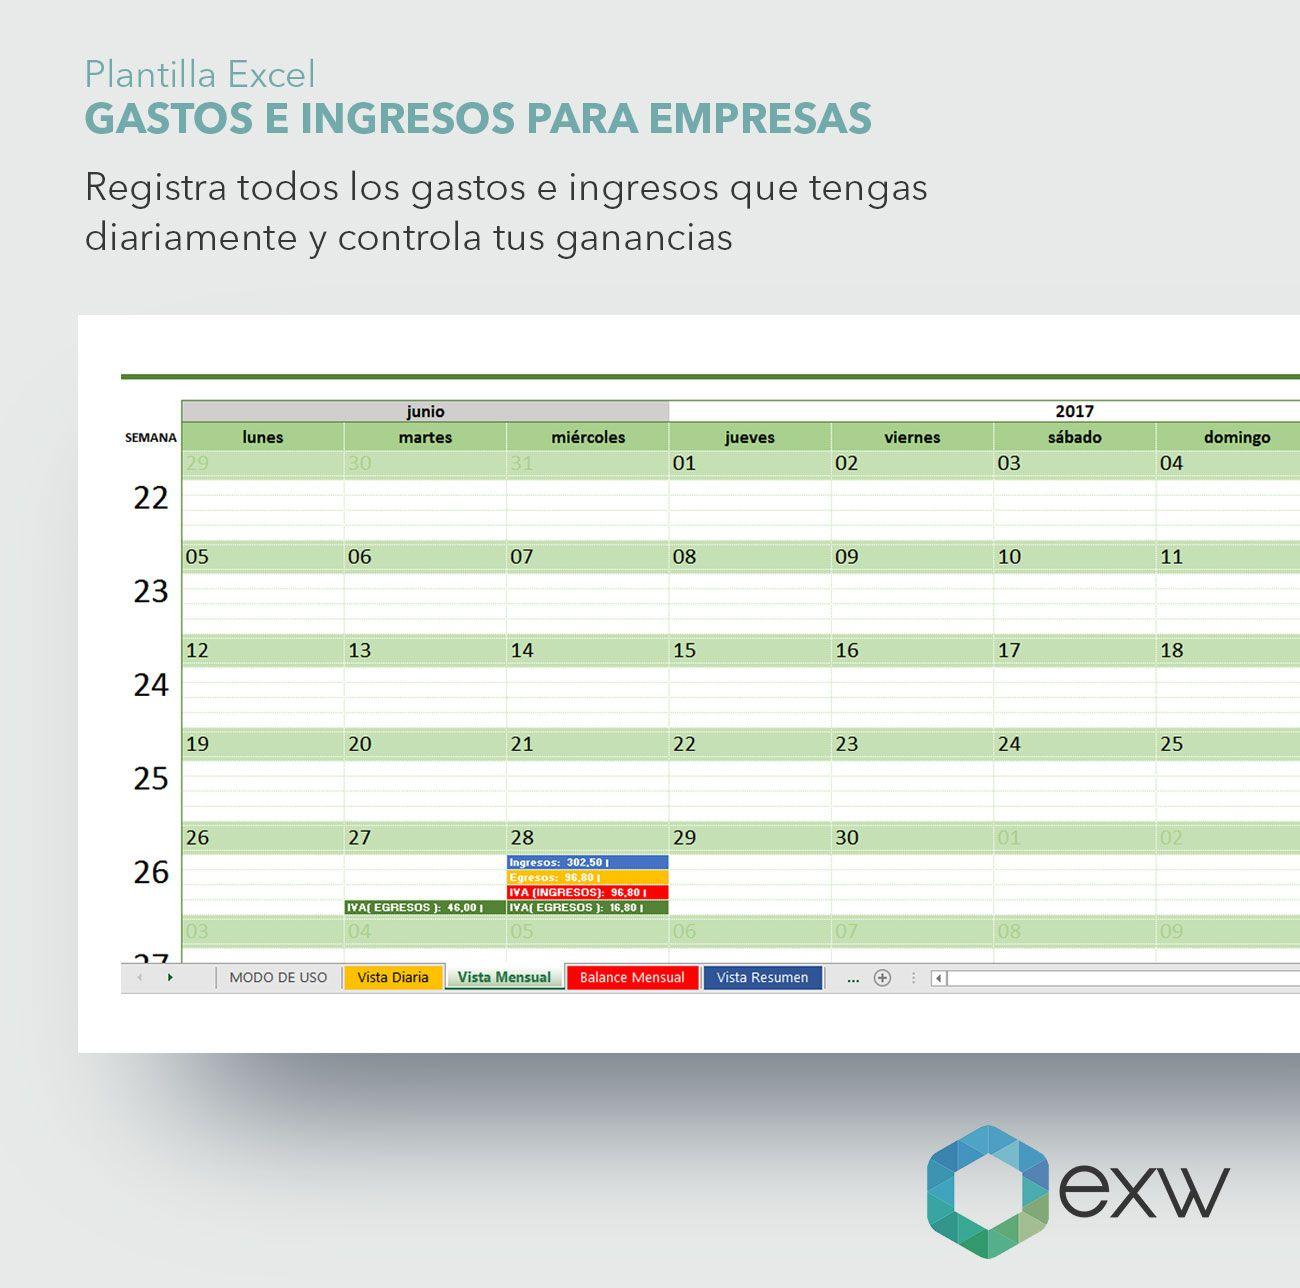 Plantilla Control Gastos E Ingresos para empresas | Just EXW